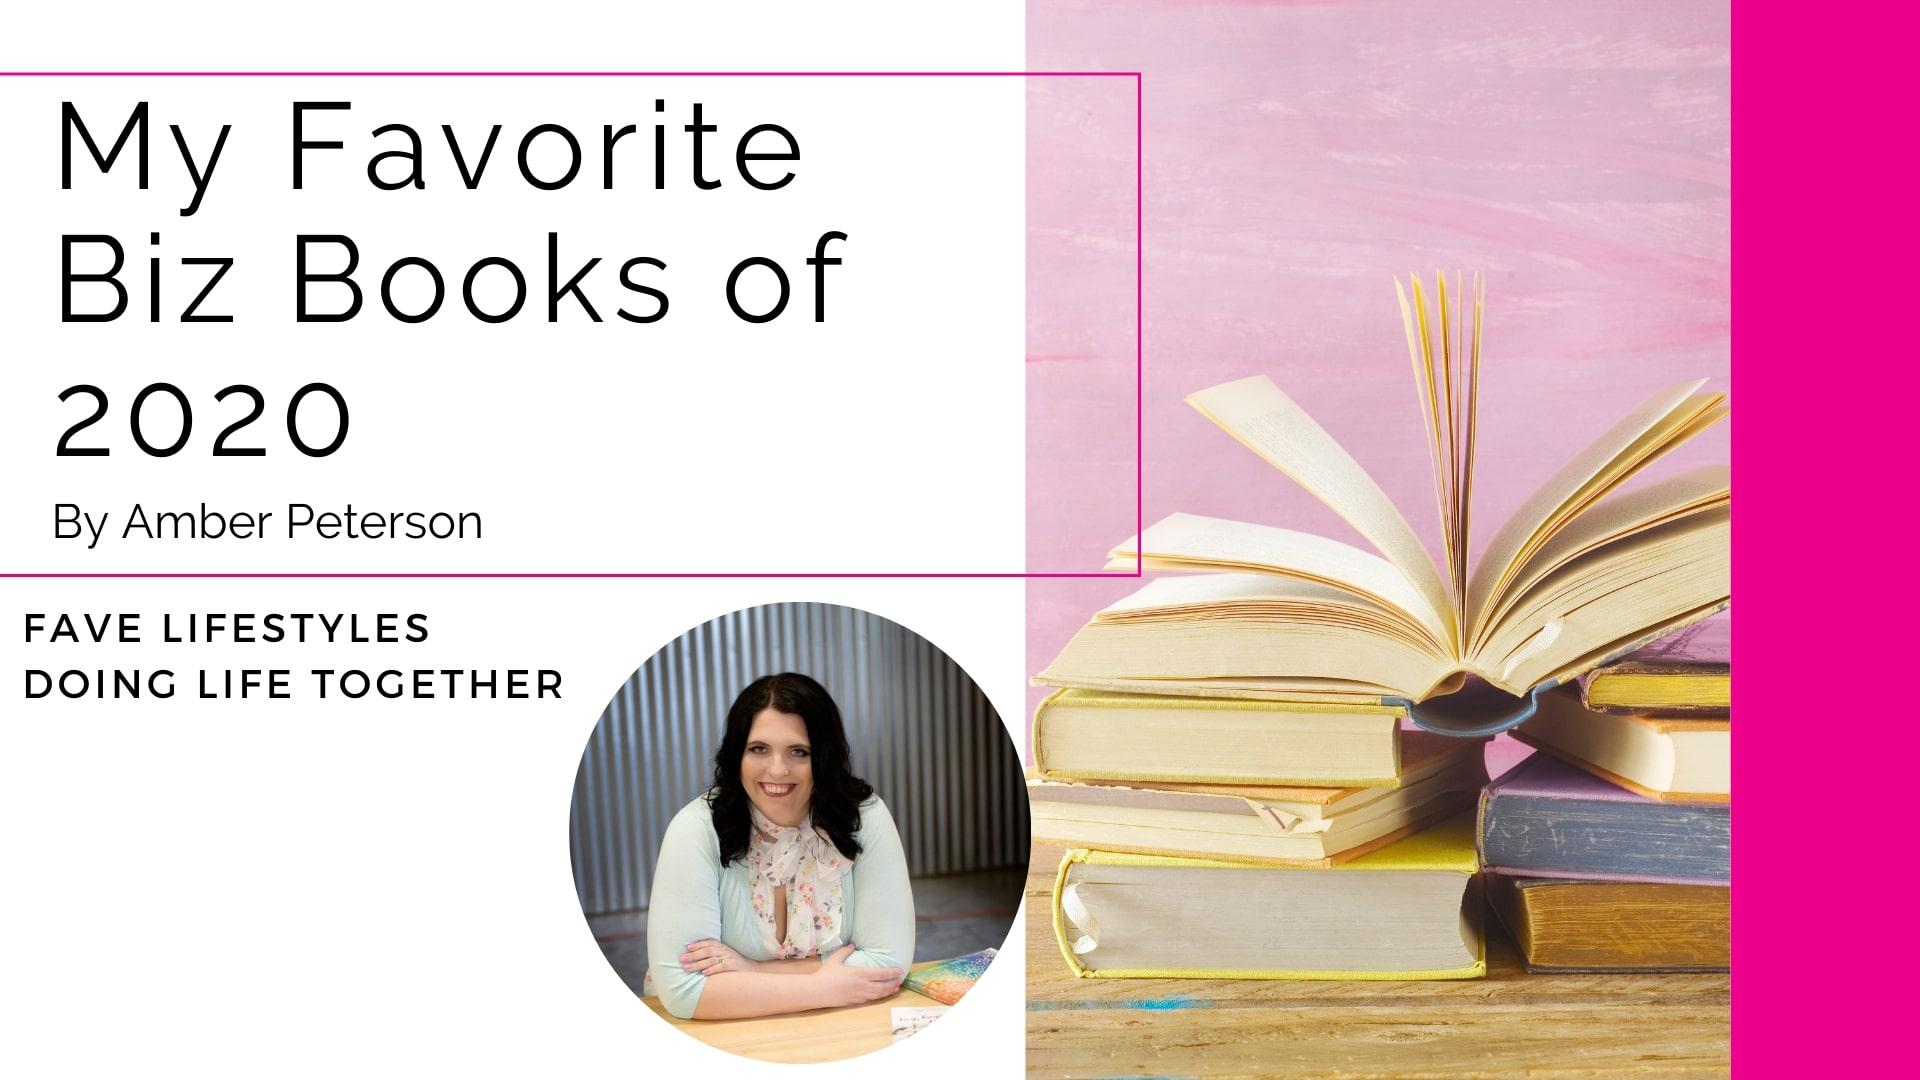 My Favorite Biz Books from 2020